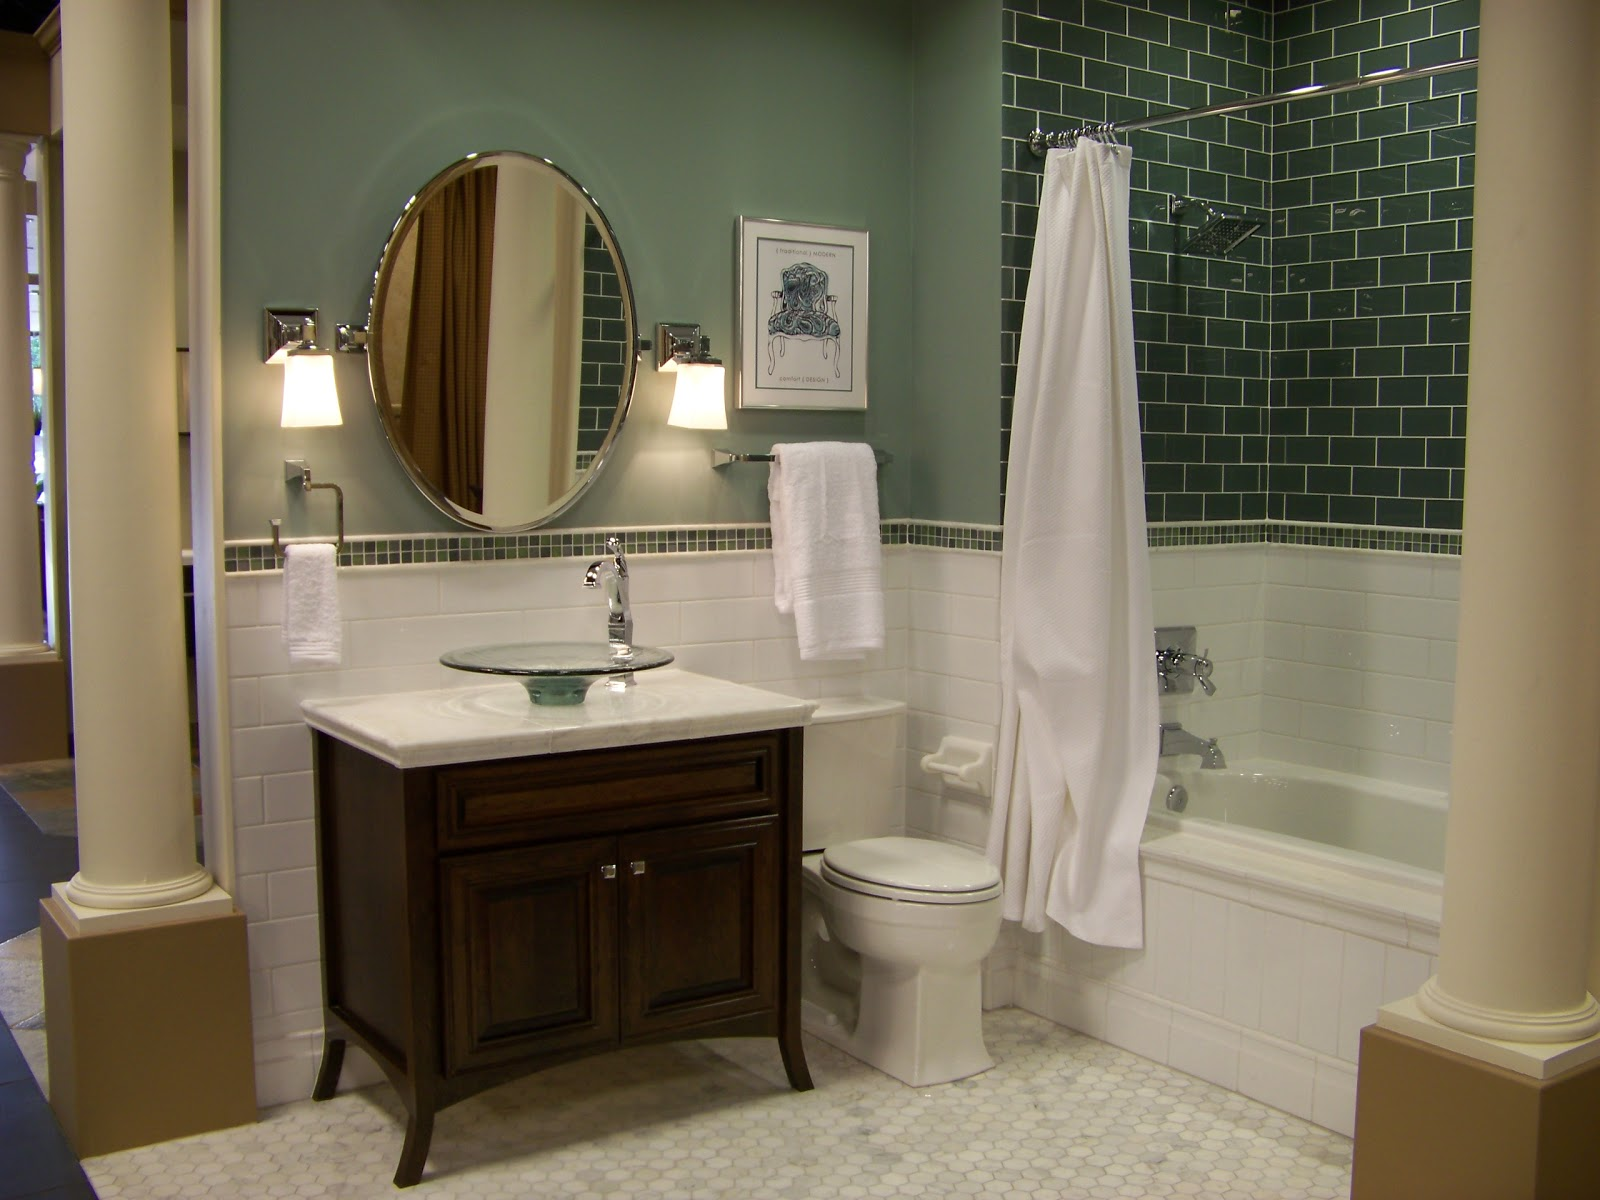 Home Decor Budgetista: Bathroom Inspiration - The Tile Shop on Bathroom Ideas Subway Tile  id=94254